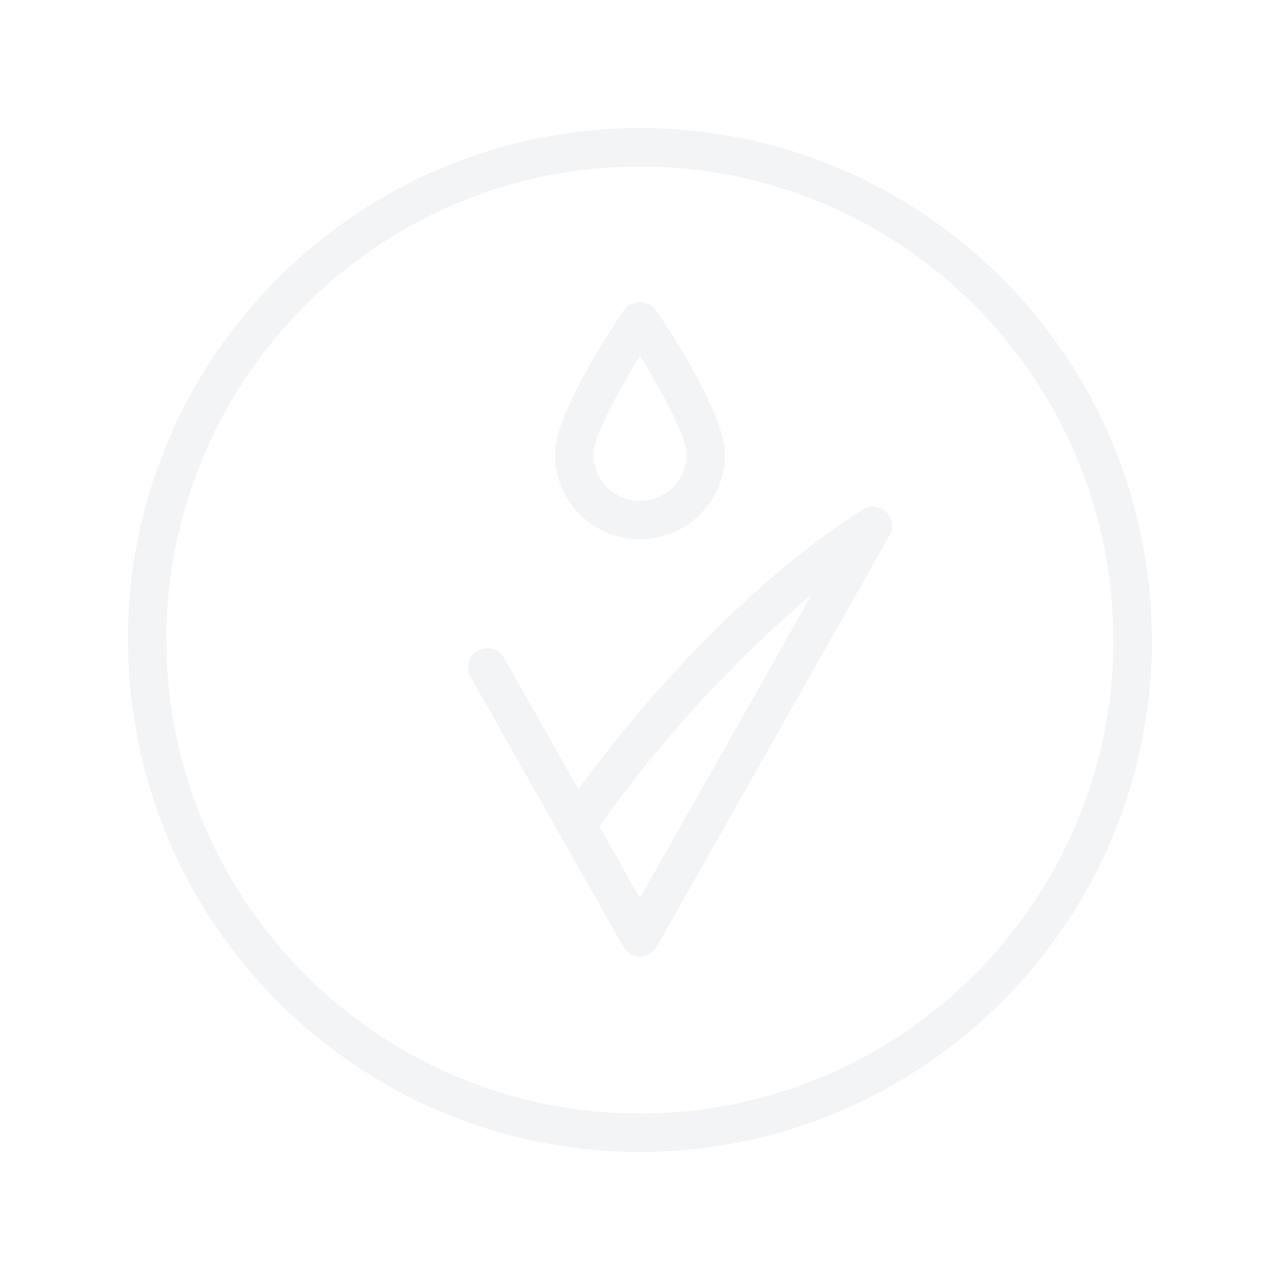 BEAUTYBLENDER Instaclean Cleansing Spray 70ml очищающий спрей